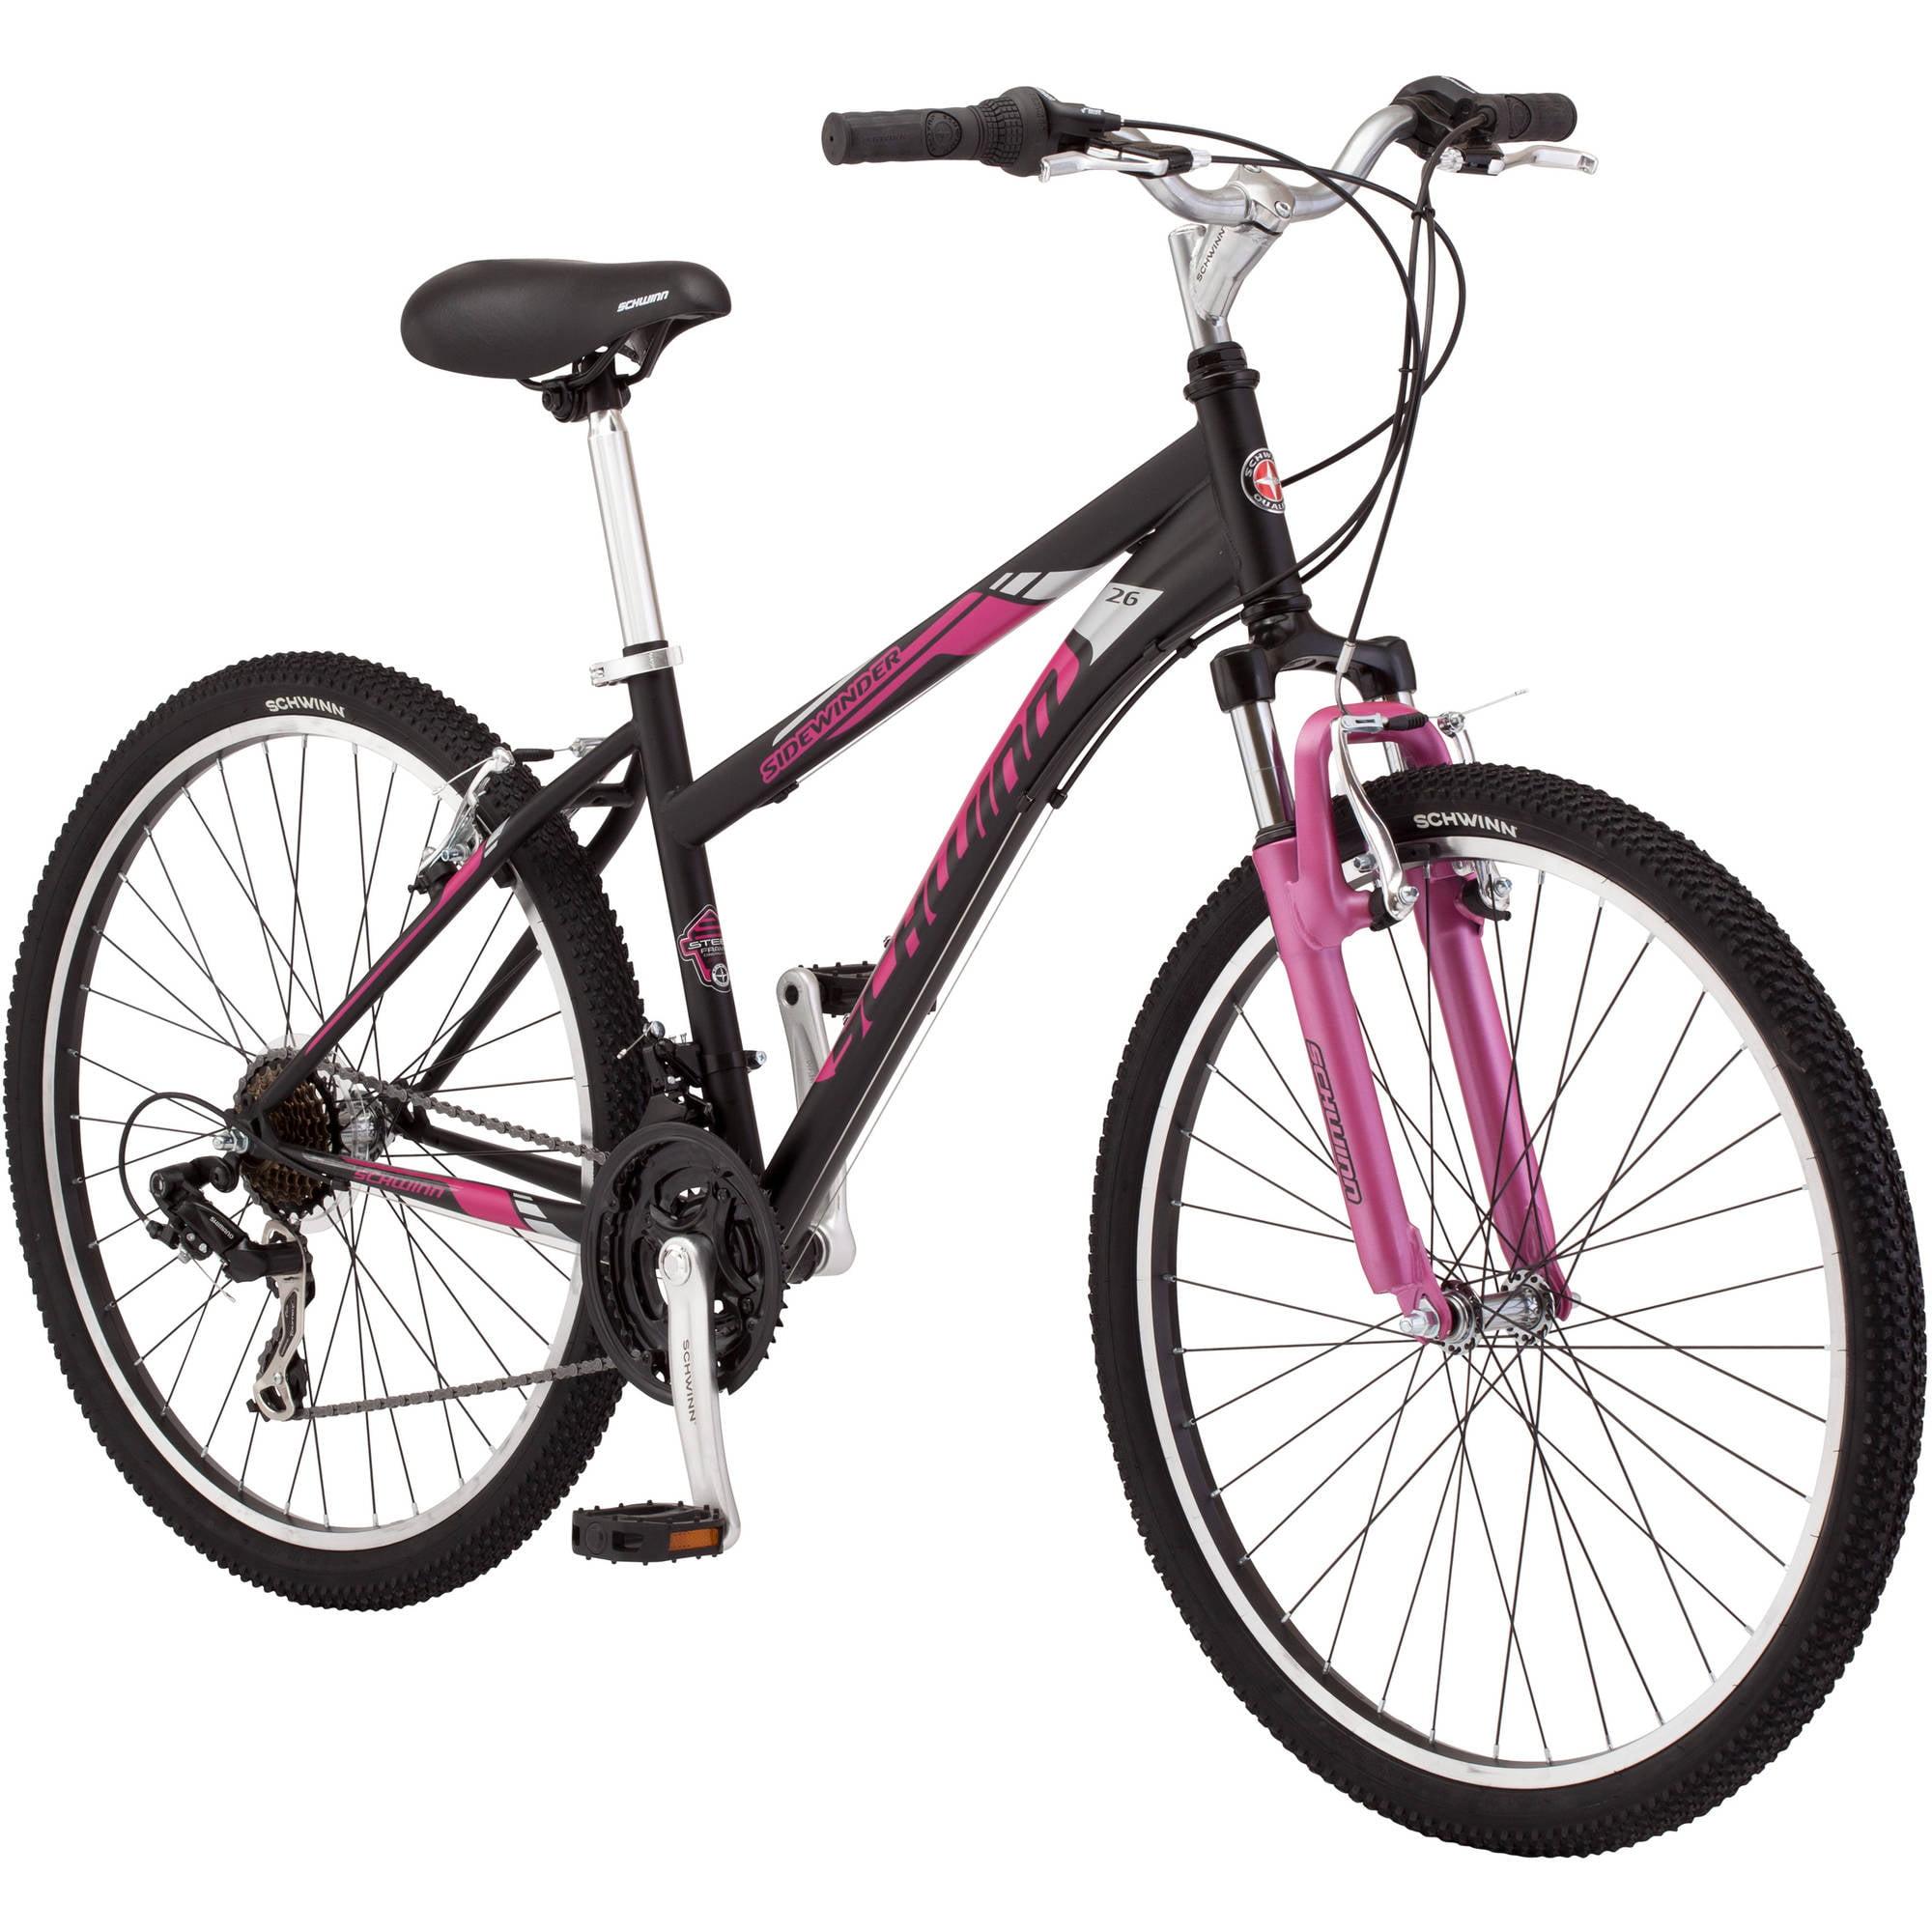 "Roadmaster Granite Peak 26/"" Women/'s Mountain Bike Black//Pink 26/"""